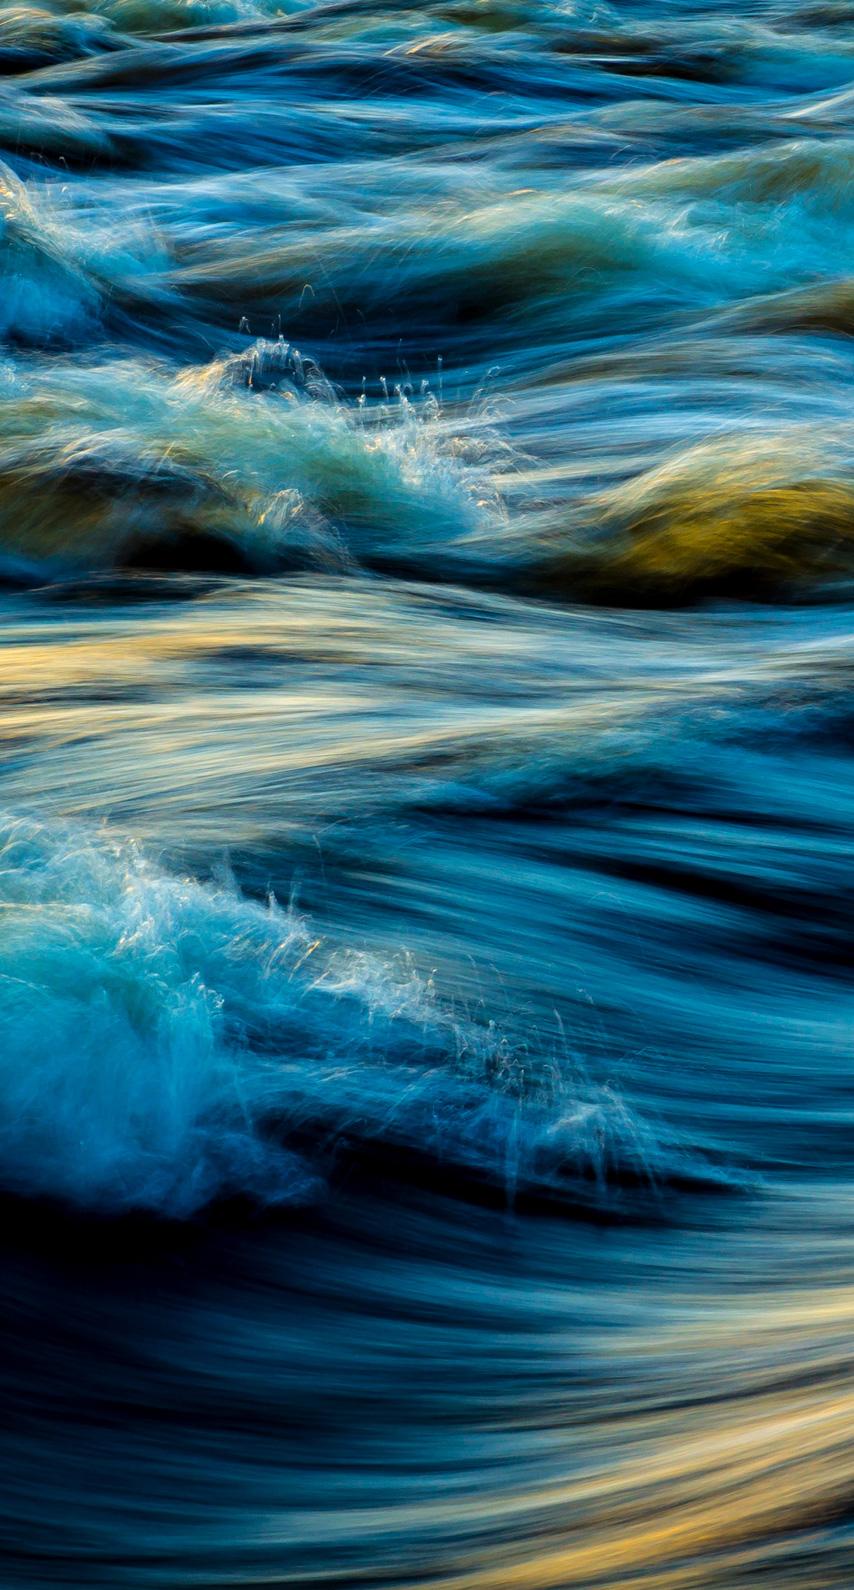 splash, abstract